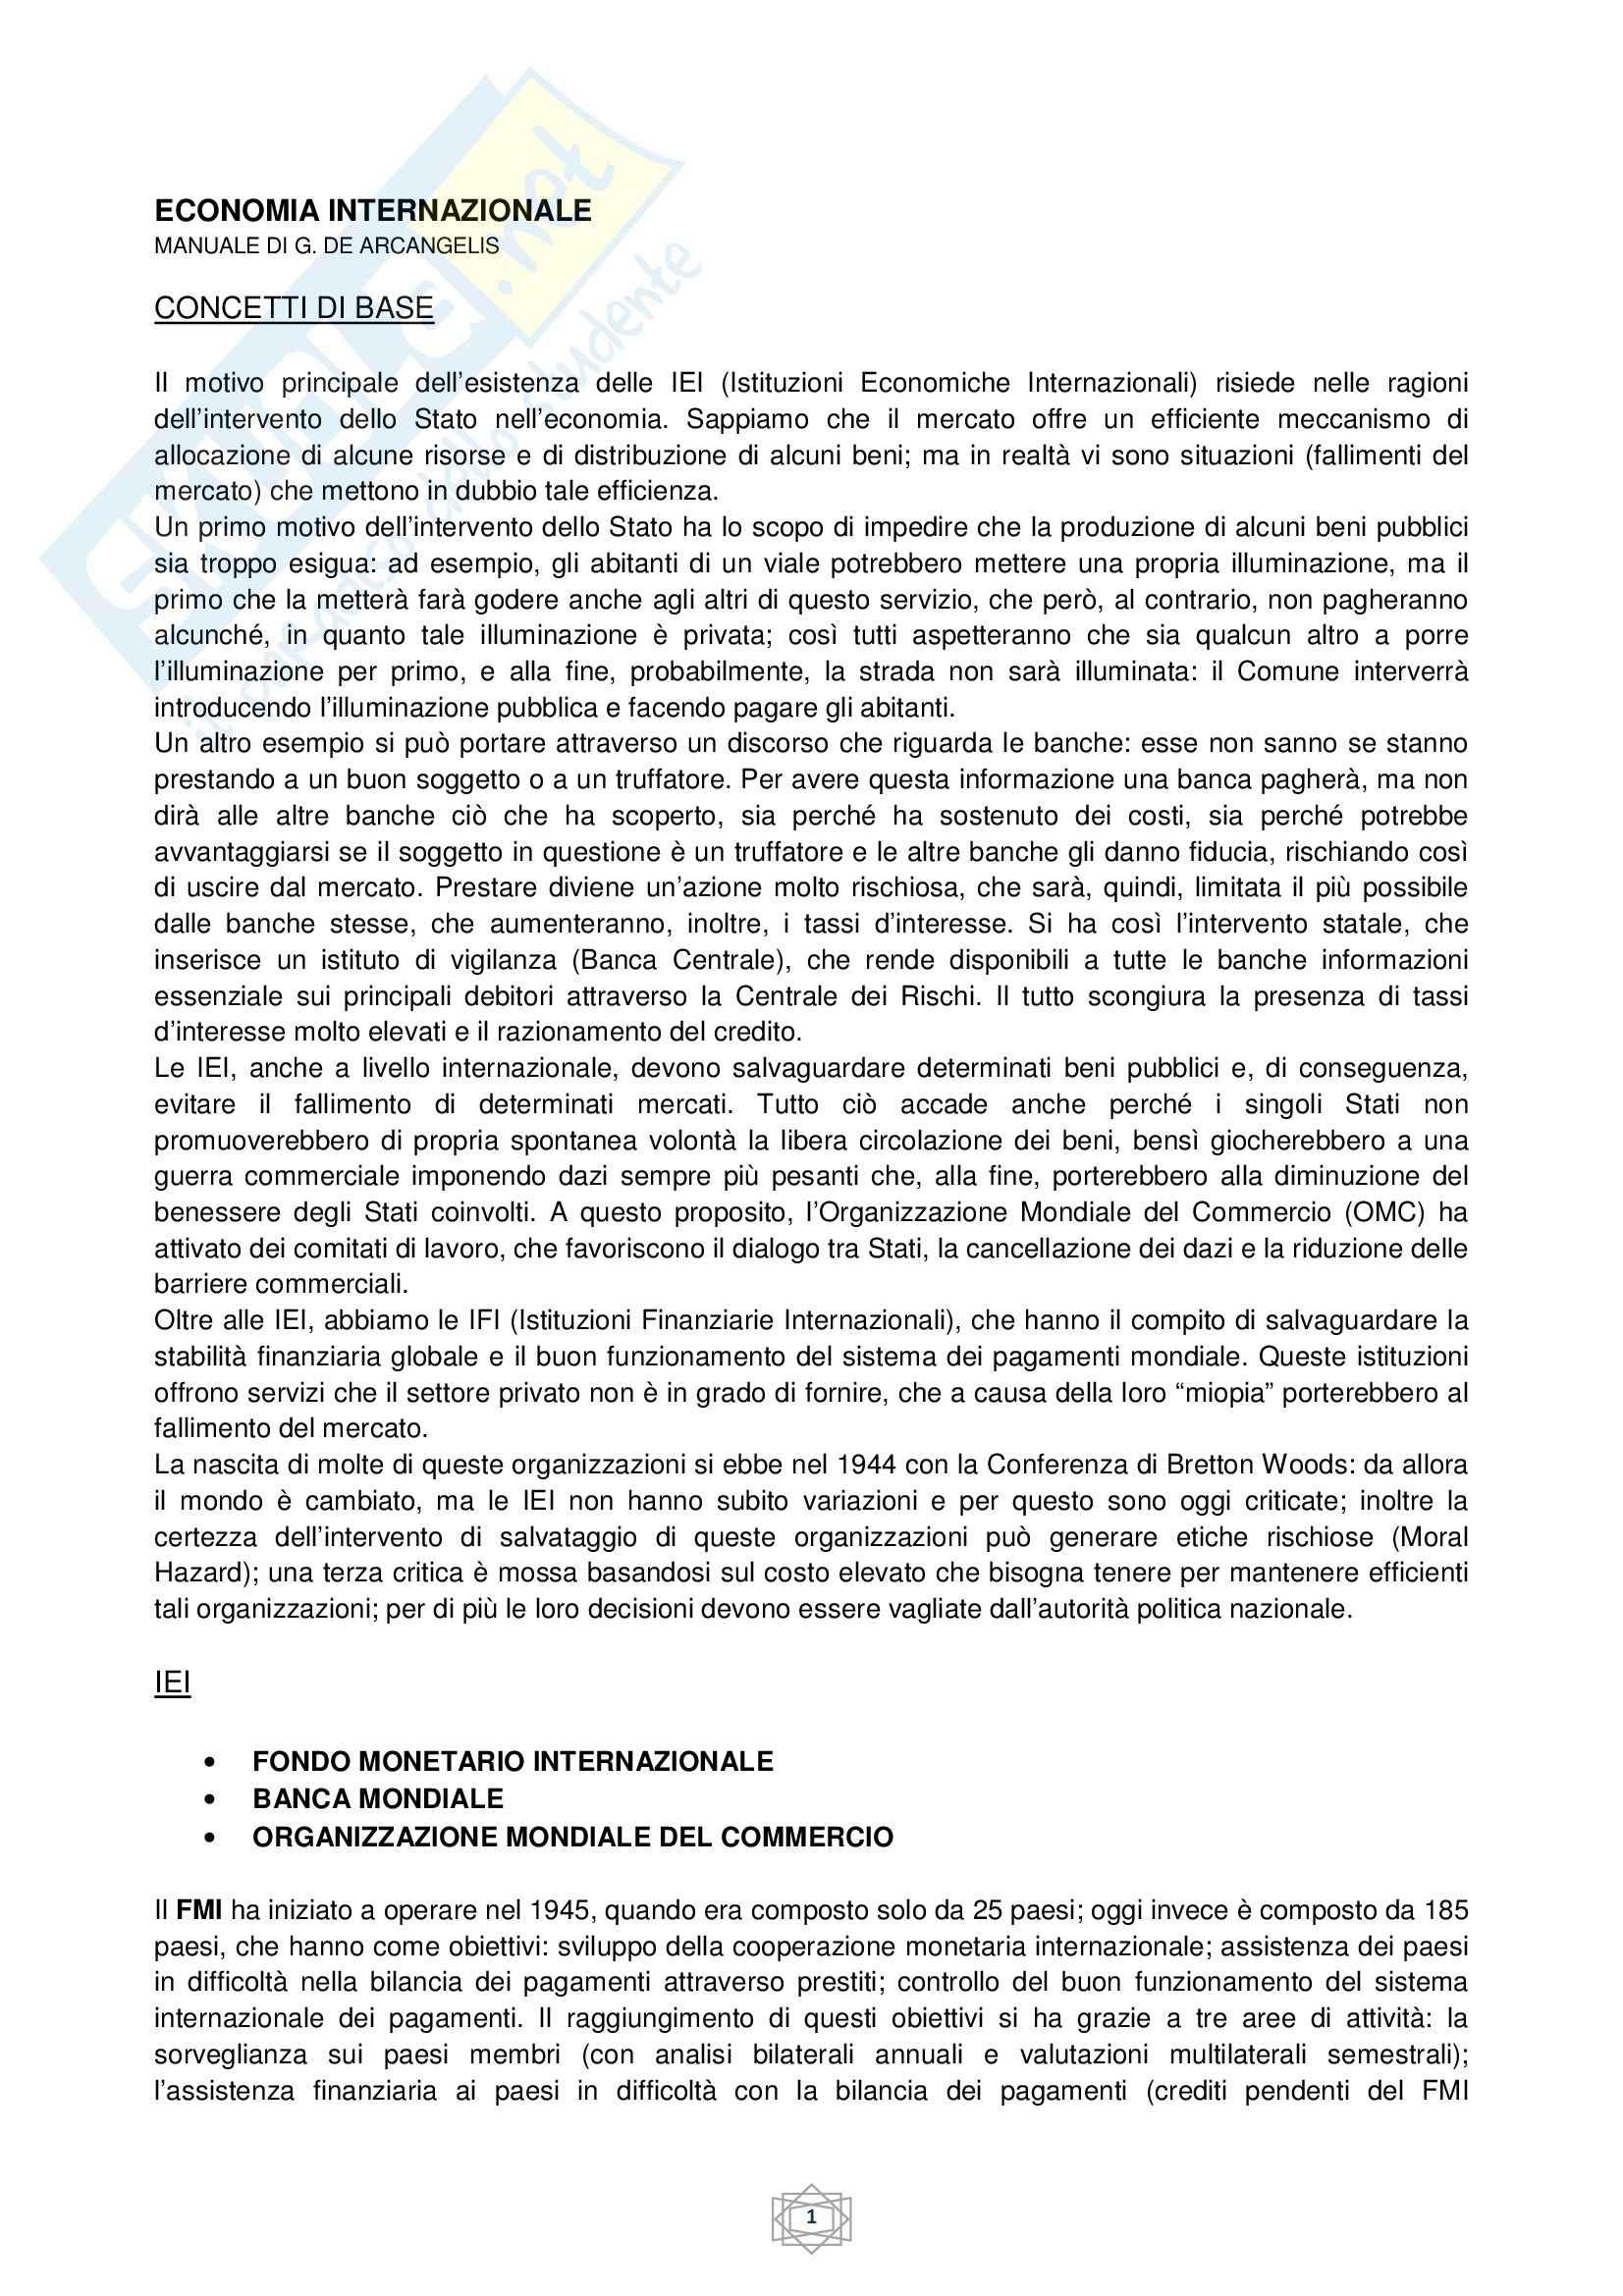 Riassunto esame Economia internazionale, prof. Atzeni, libro consigliato Economia internazionale, di De Arcangelis